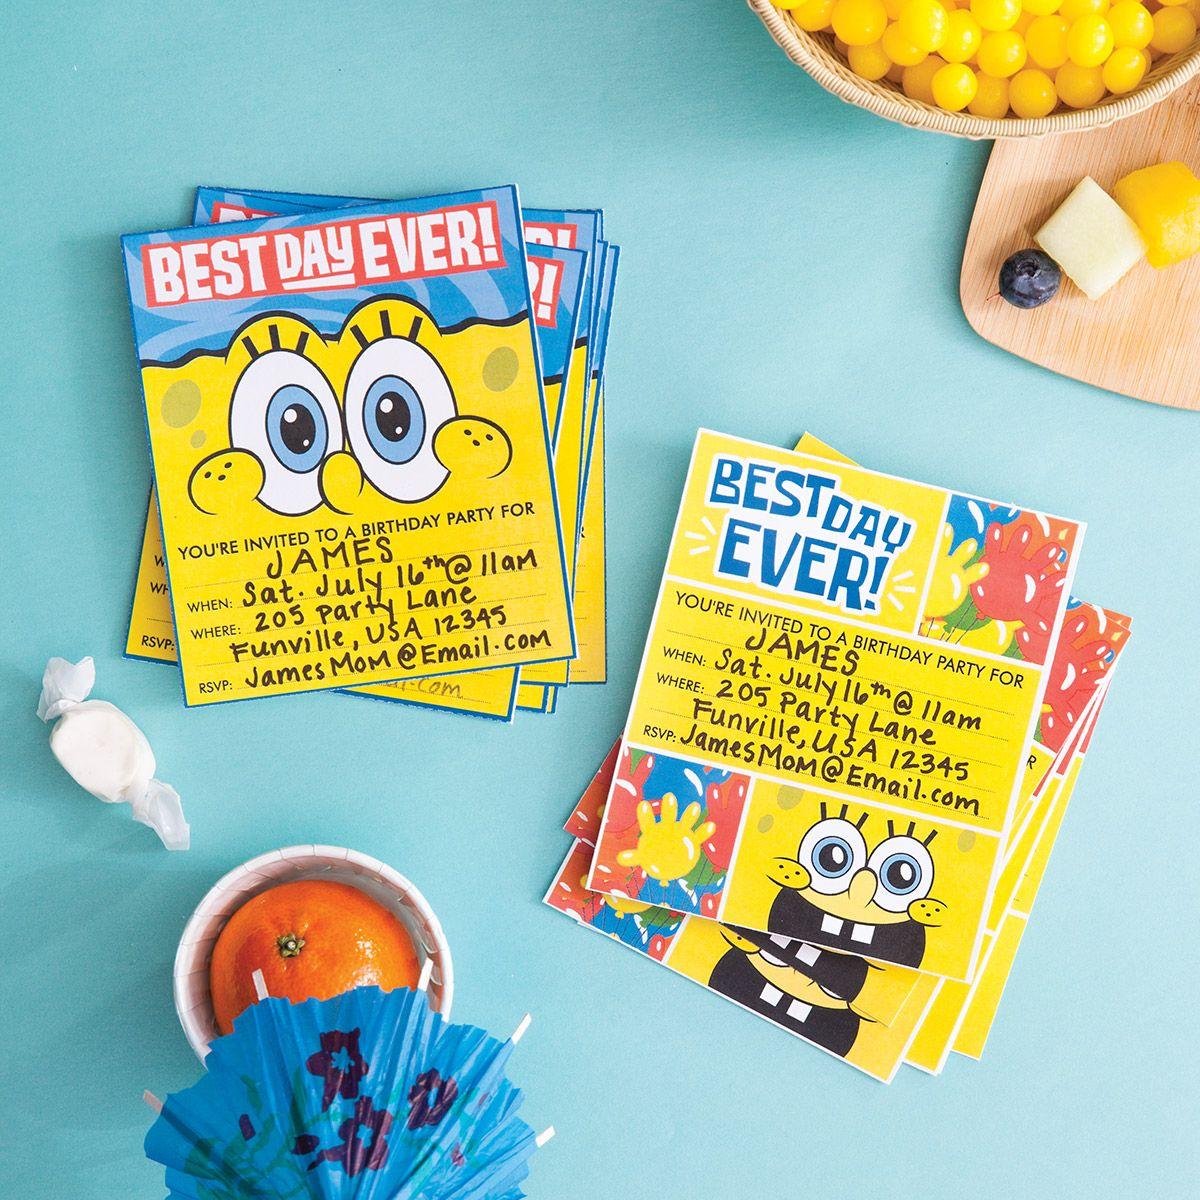 Plan a SpongeBob SquarePants Party | Spongebob birthday ...